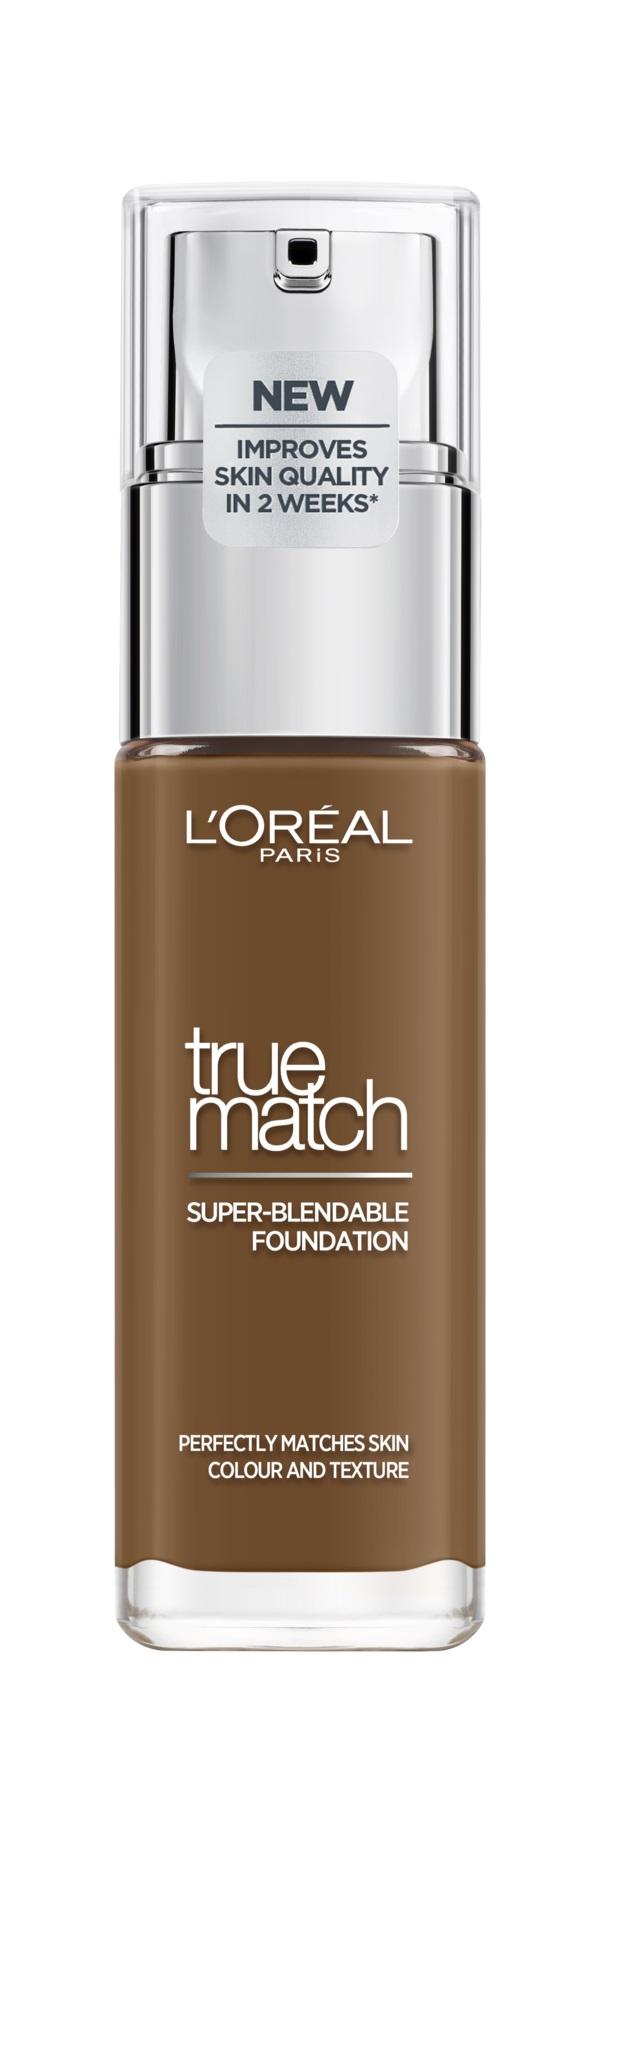 true match foundation kicks